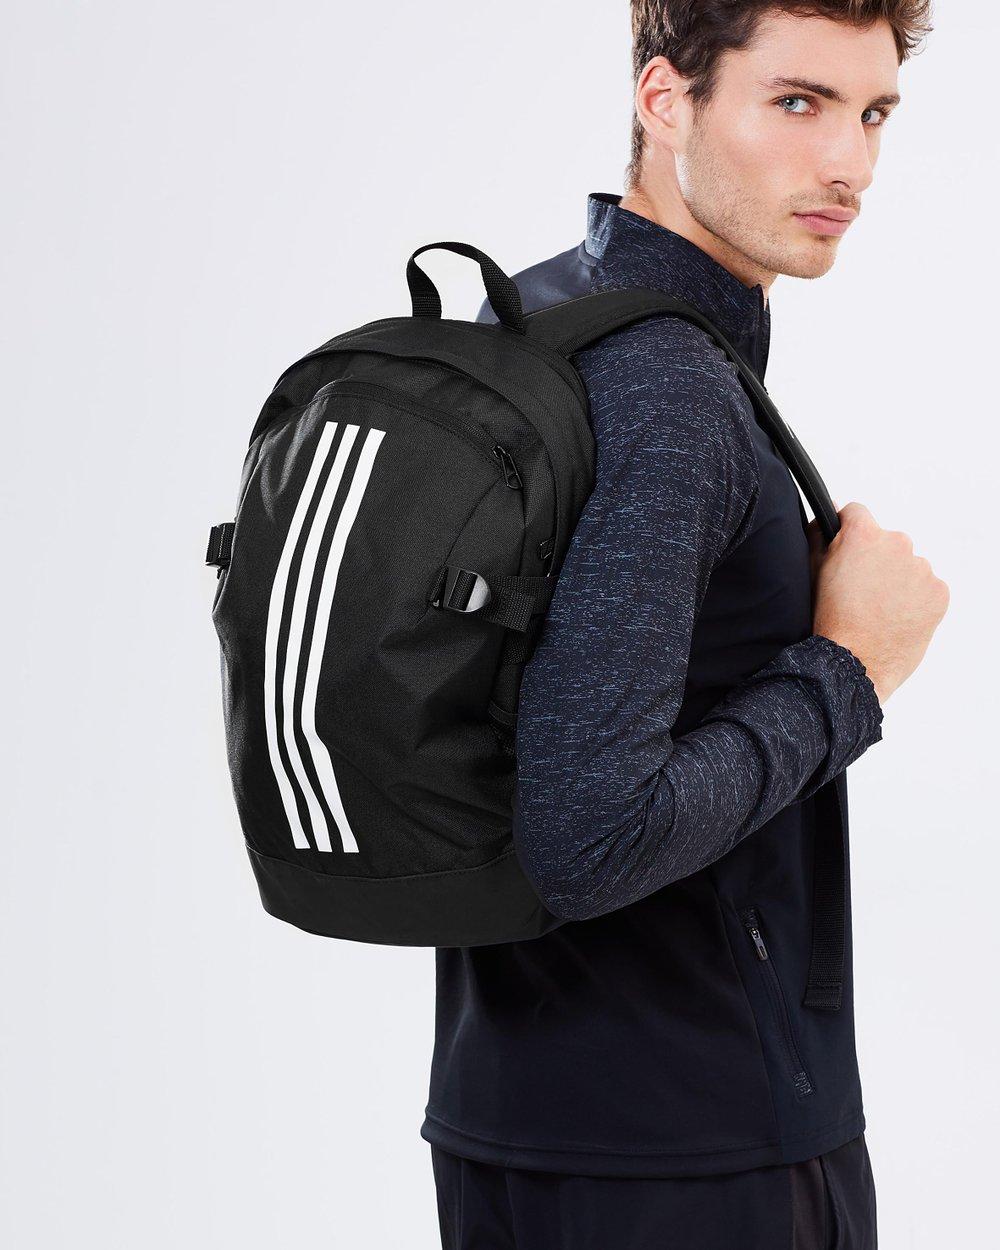 92238c48890e BP Power IV Backpack Medium by adidas Performance Online